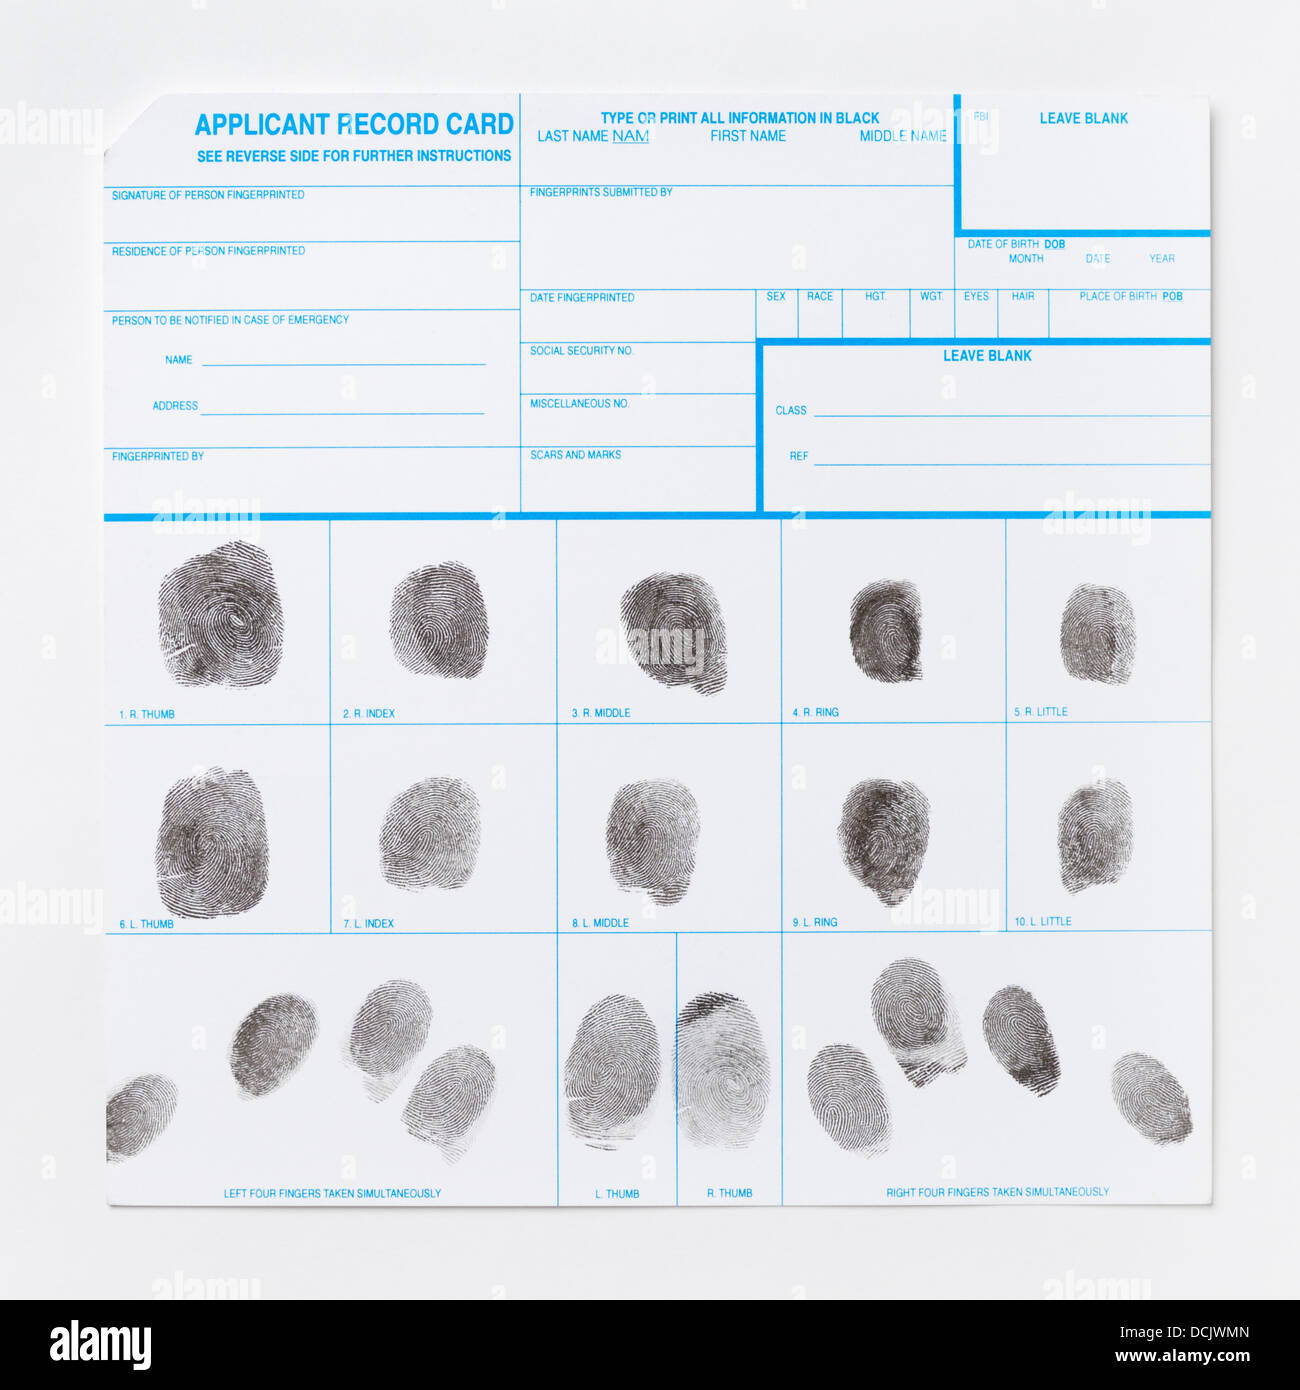 Fingerprint Record Card - Stock Image